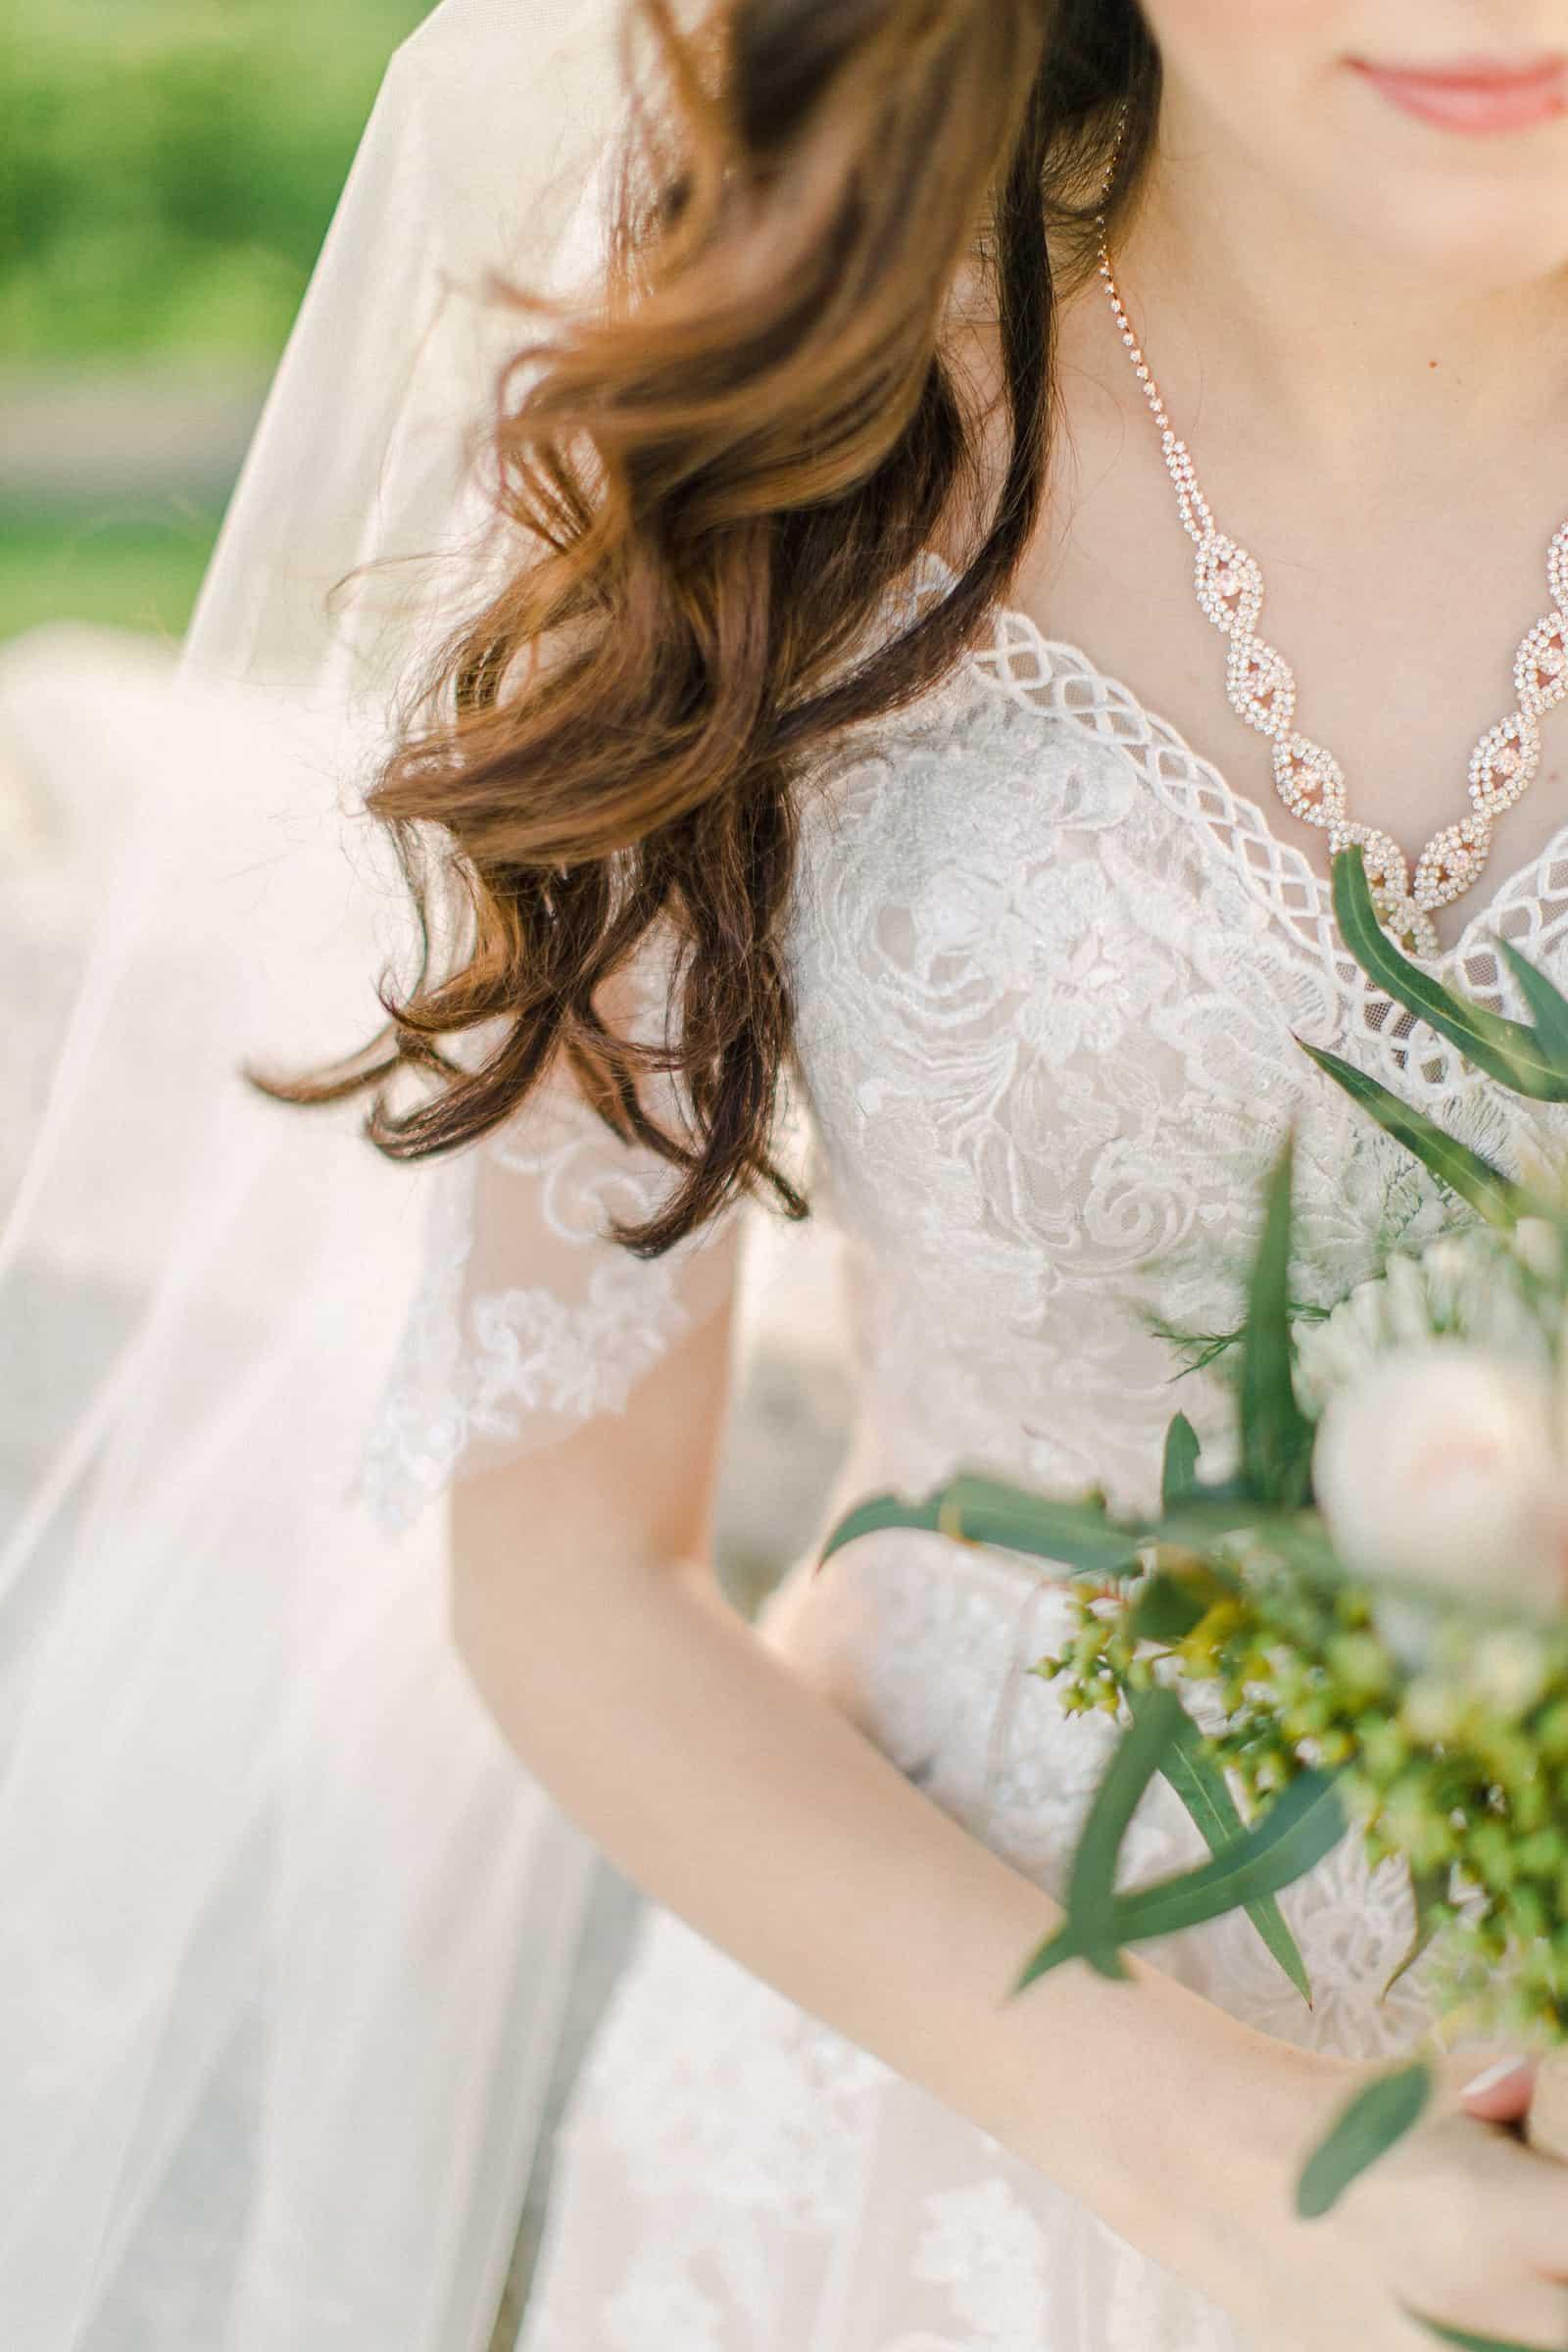 Palestinian Iranian Bride and Groom, Utah Wedding Photography at the Utah State Capitol, beautiful bride wedding dress long veil intricate lace